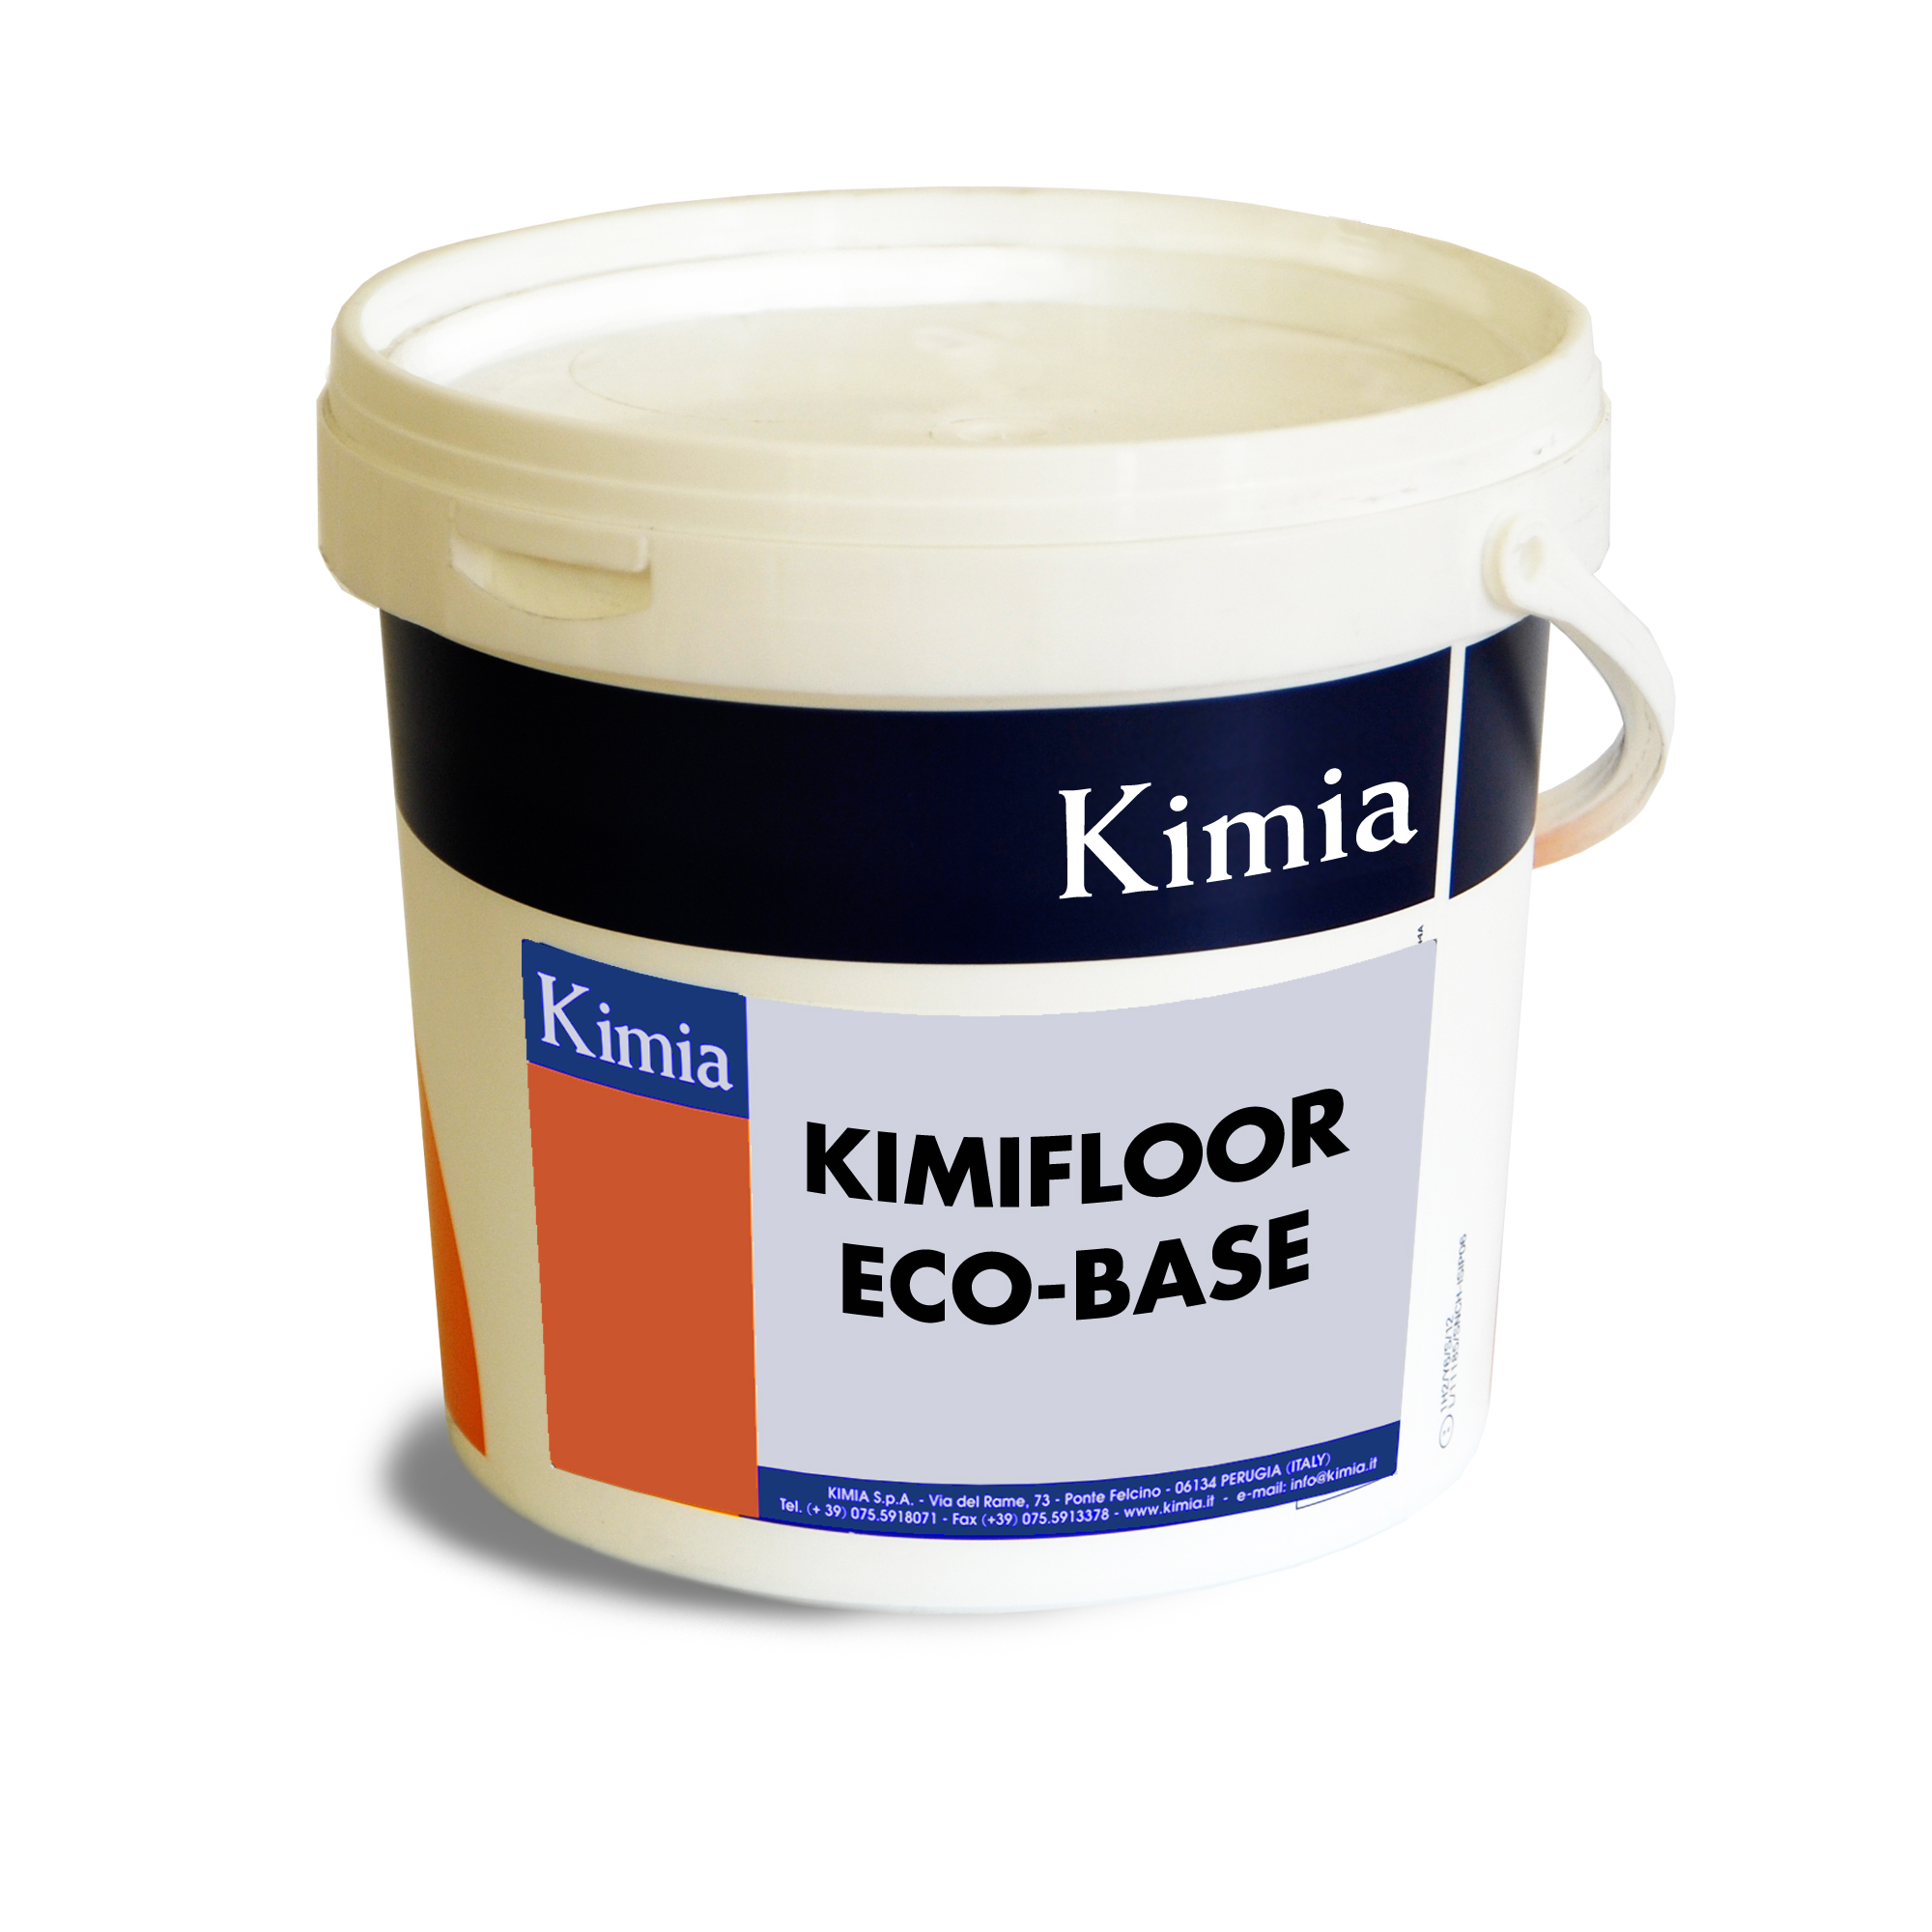 Kimifloor ECO-BASE